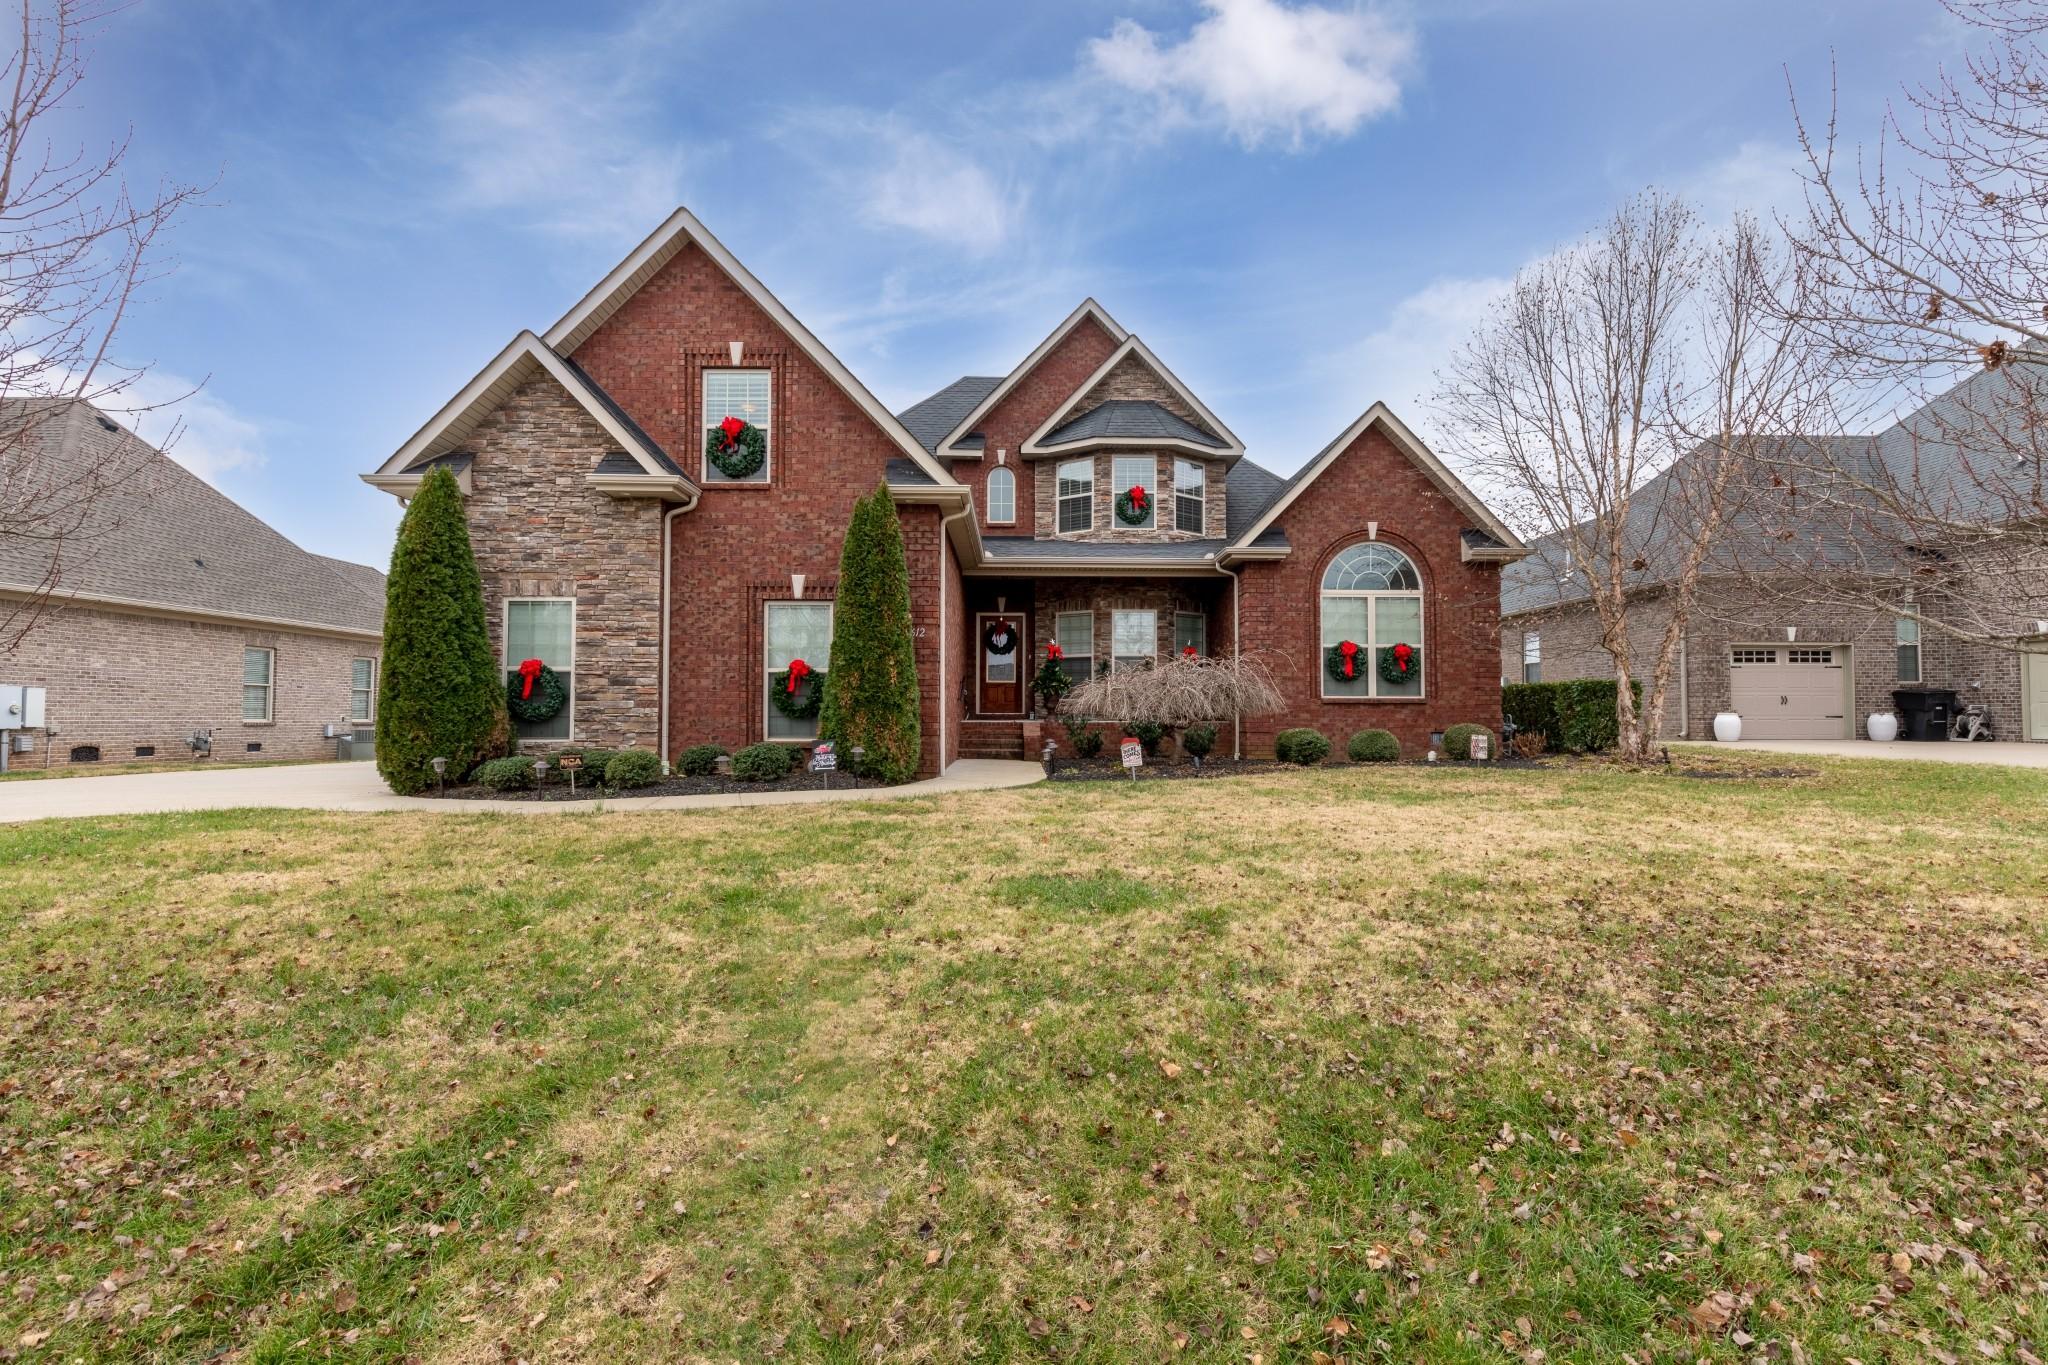 612 Gardenia Way, Murfreesboro, TN 37130 - Murfreesboro, TN real estate listing